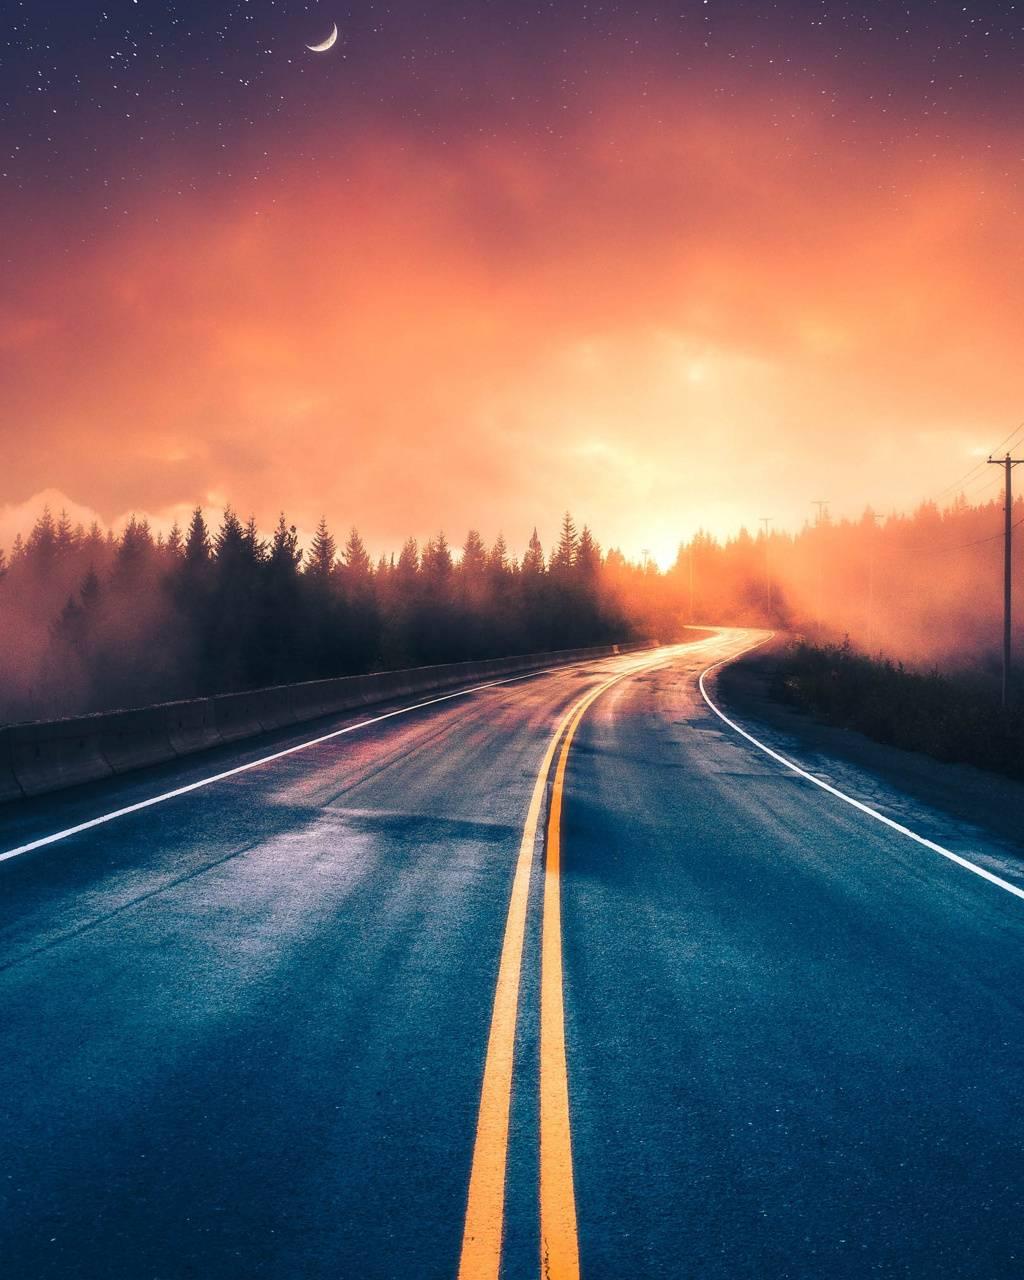 Road nature